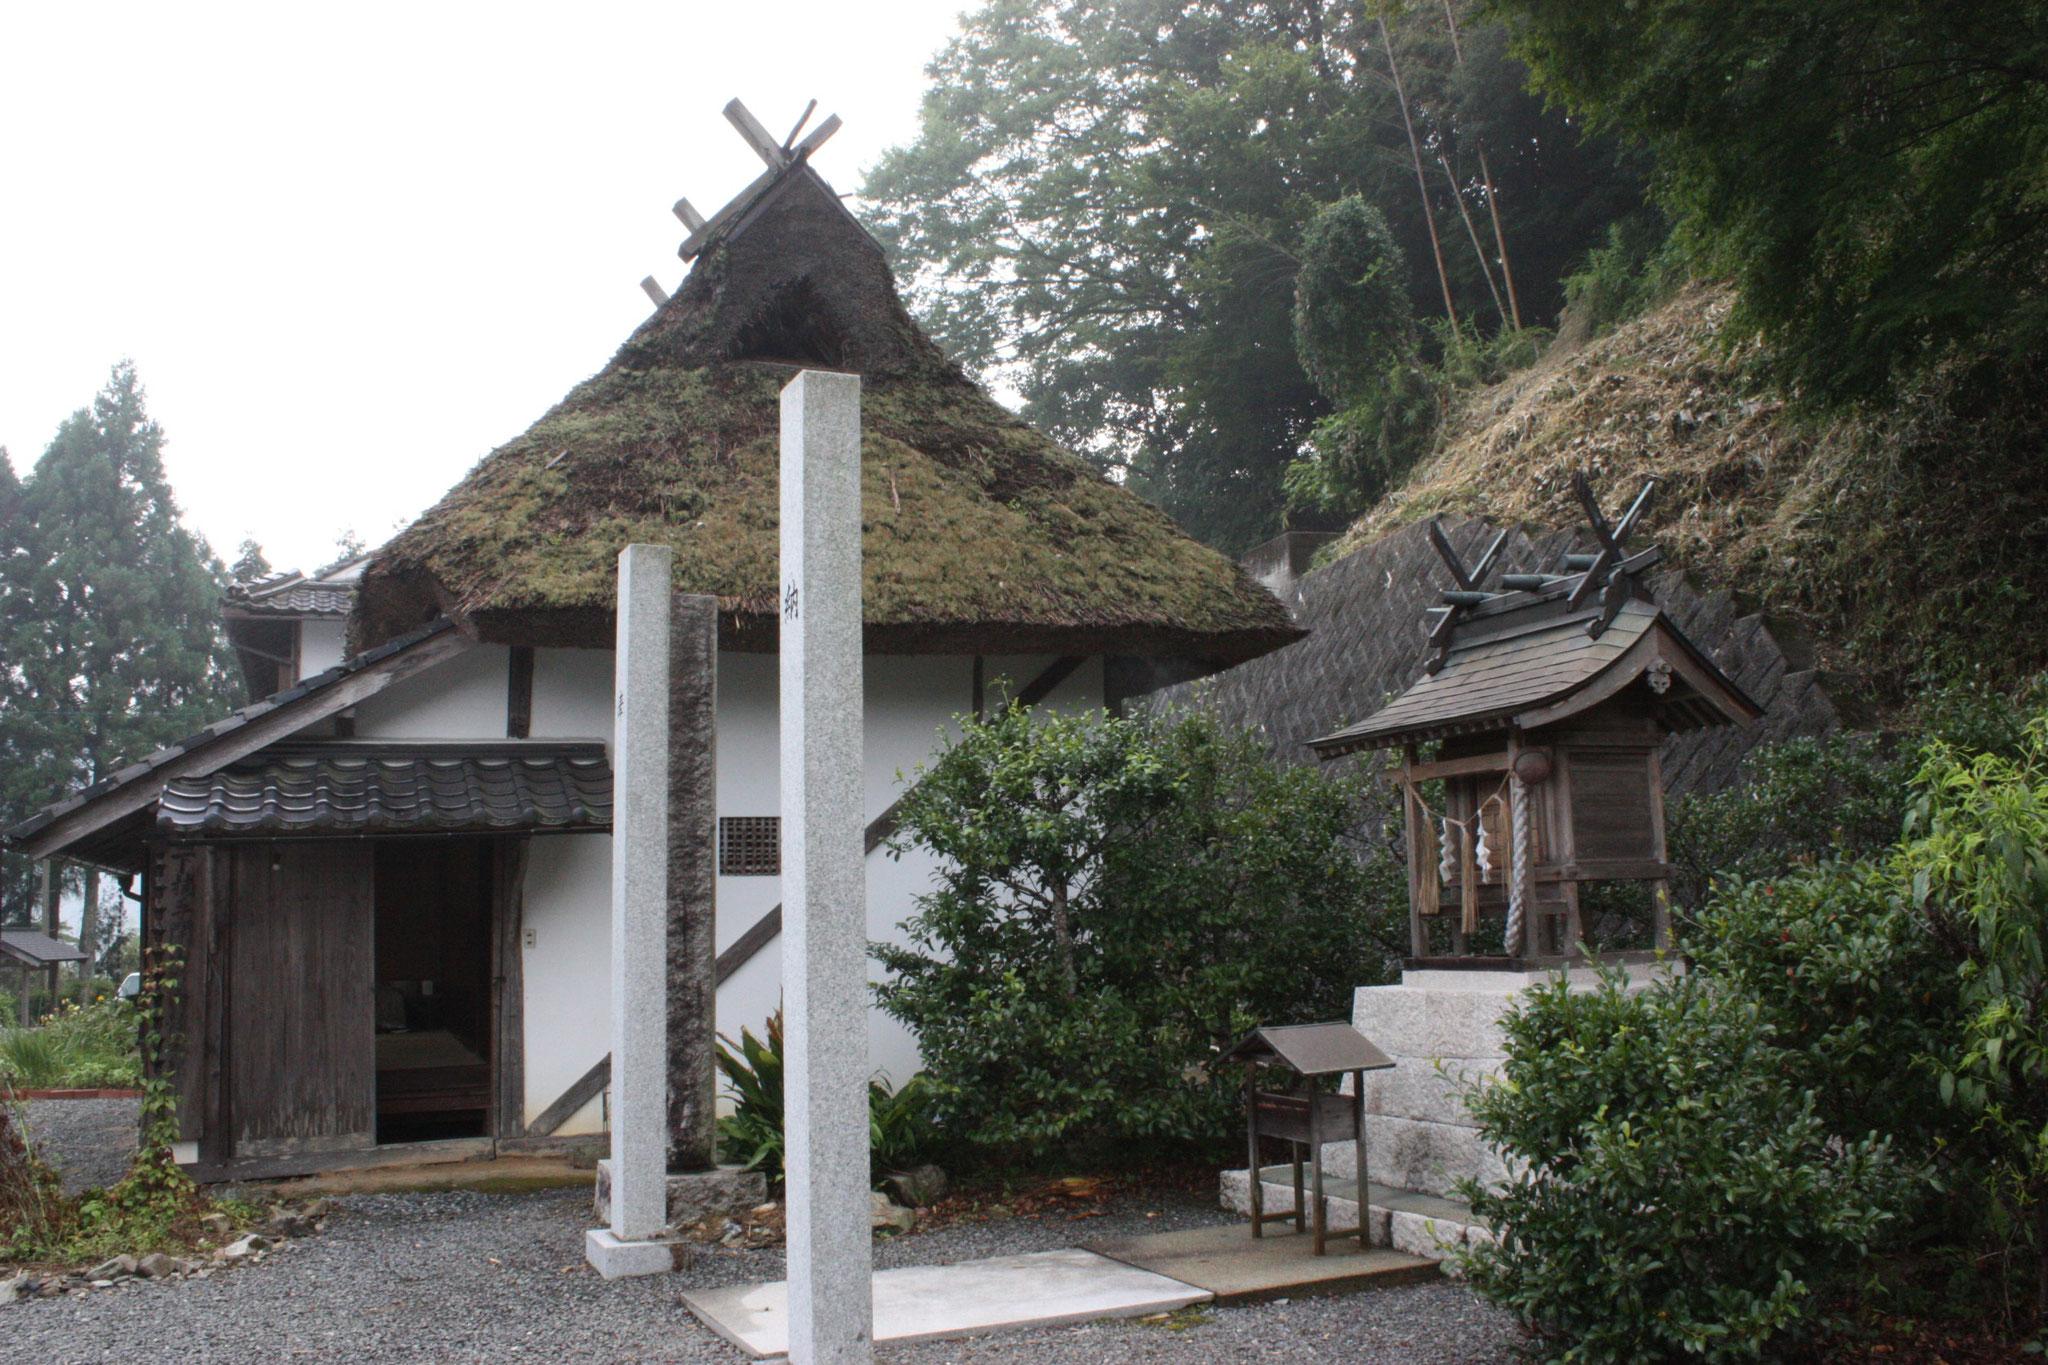 Above lies the Headquarters Dojo and Shrine